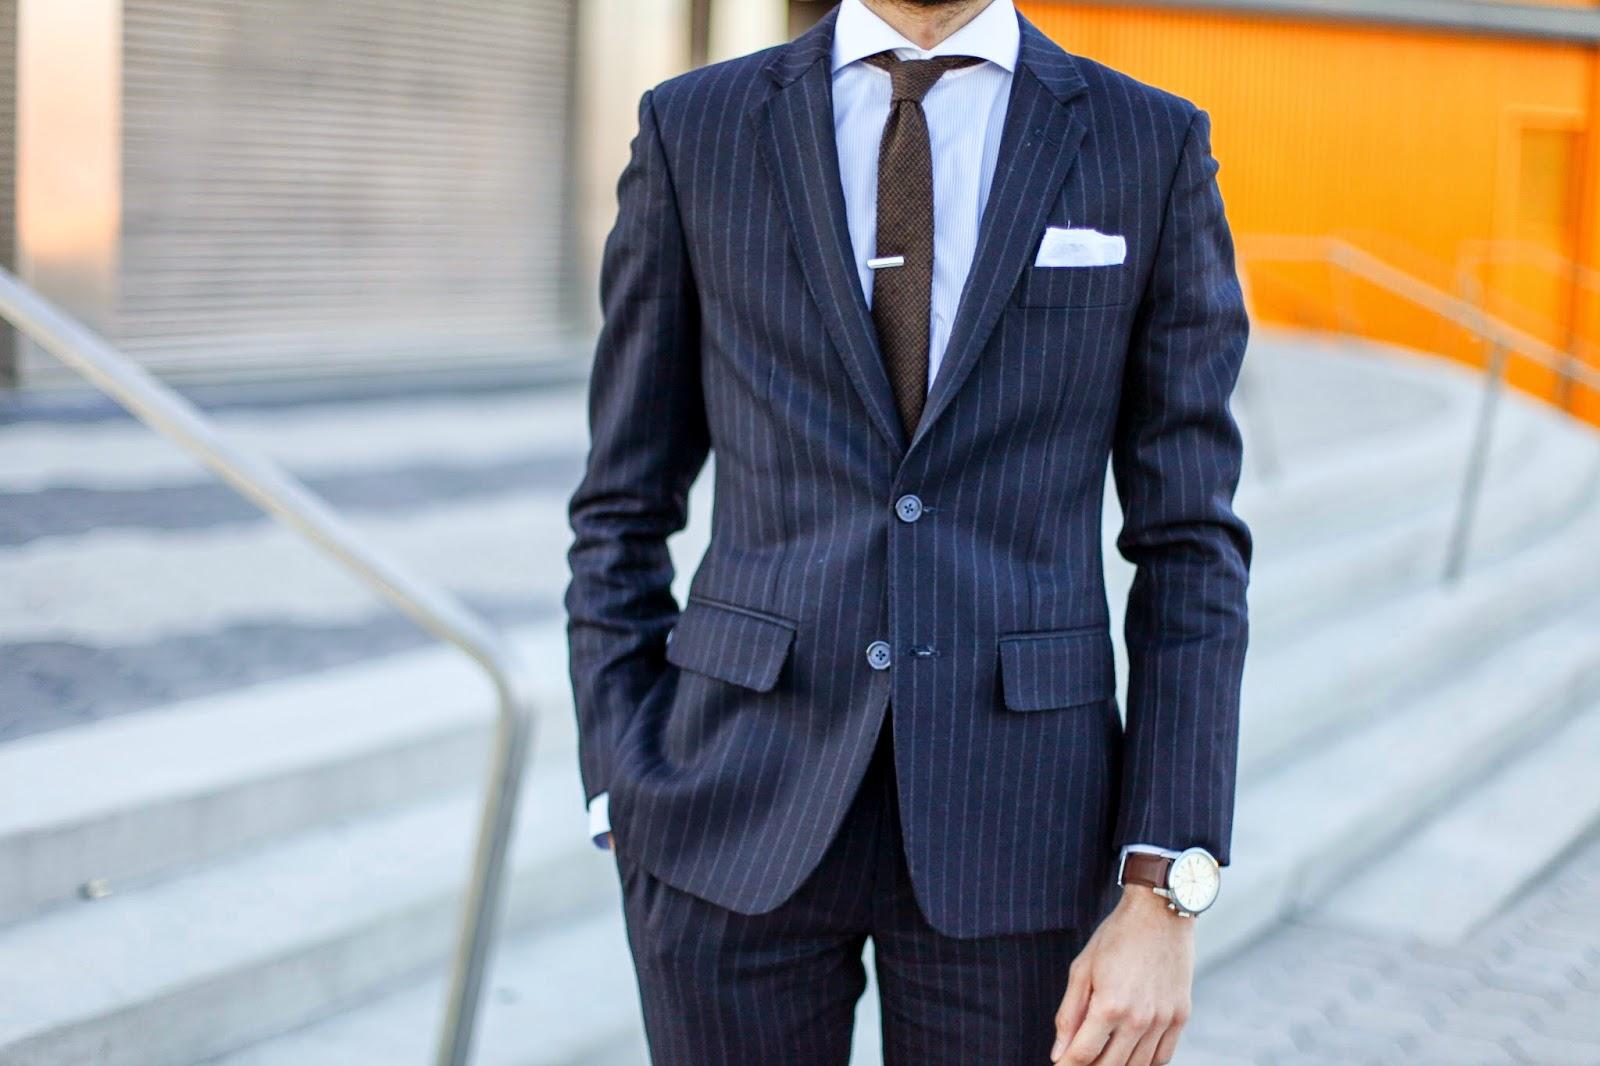 Born To Tailor Bespoke Custom Tailor Suits New York Varun Gandhi 7.JPG